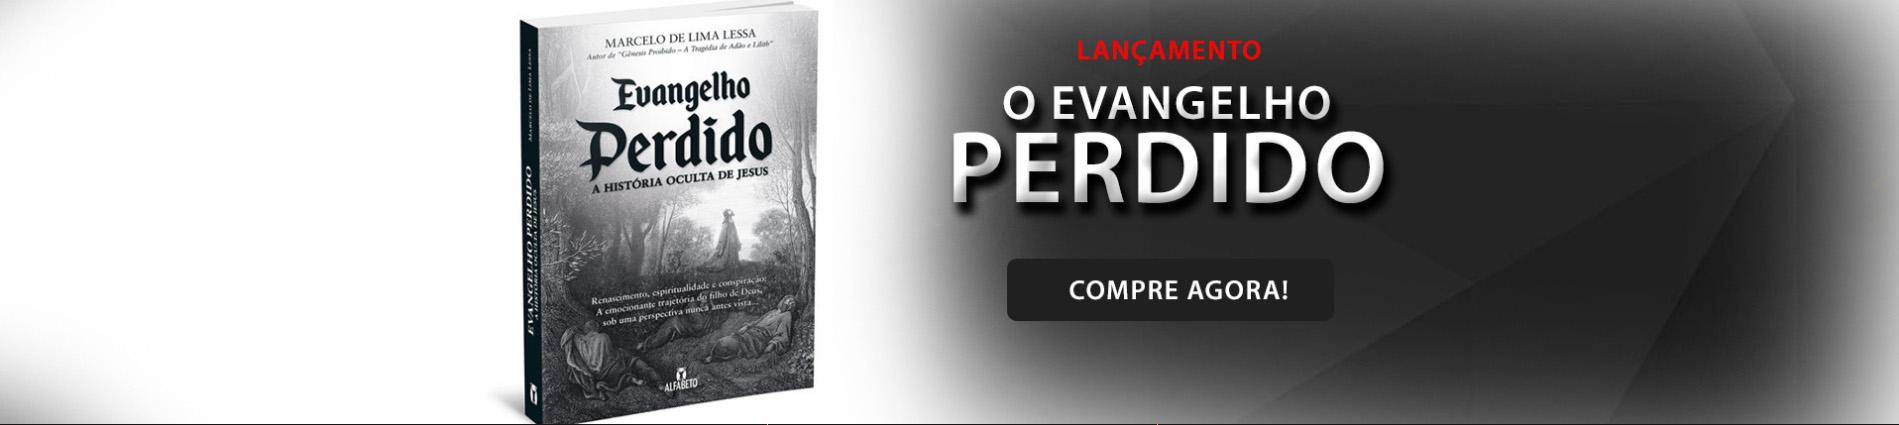 https://cdn.brasilesoterico.com/imagens_banners/8d16534d4d039068e1ea048e1da52537.jpg